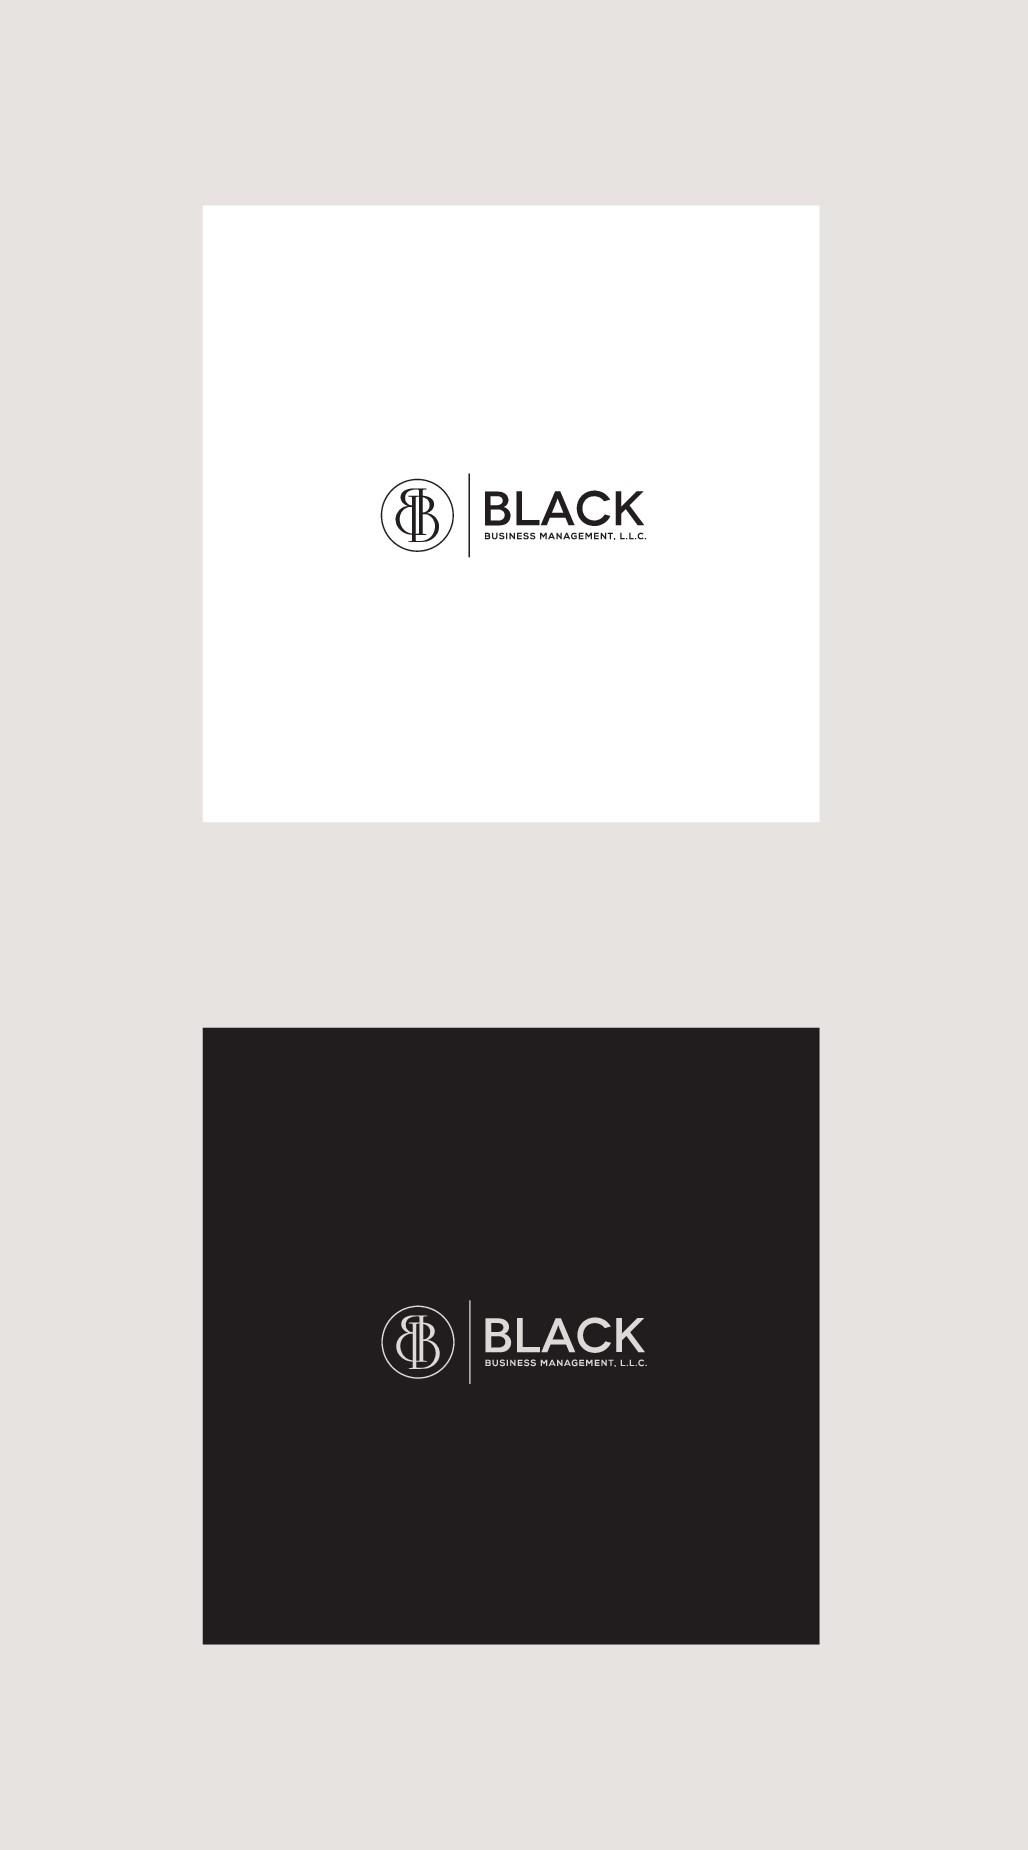 Black Business Management logo design contest